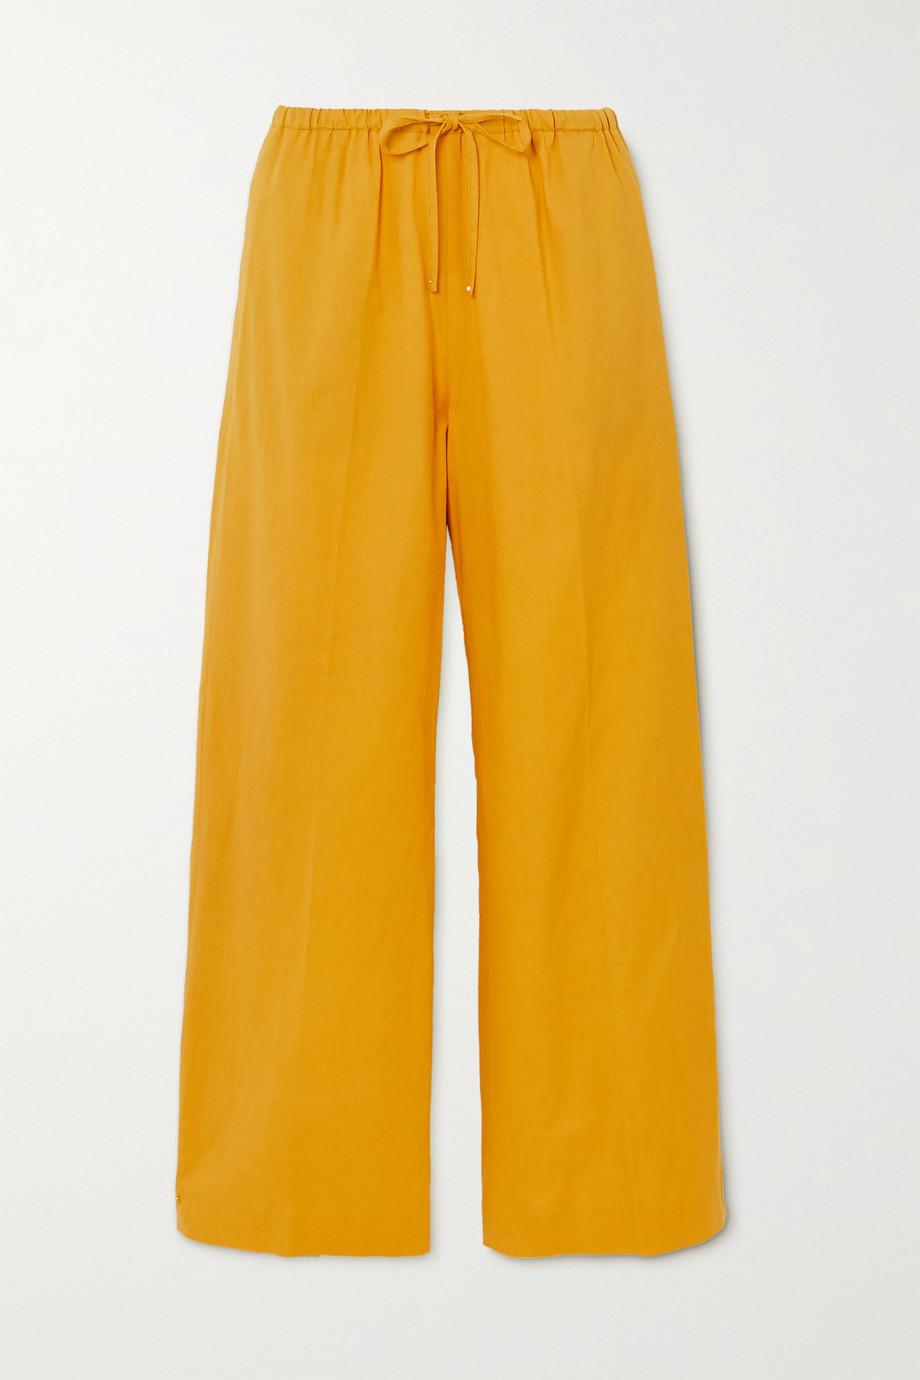 Dries Van Noten Cotton-blend wide-leg pants